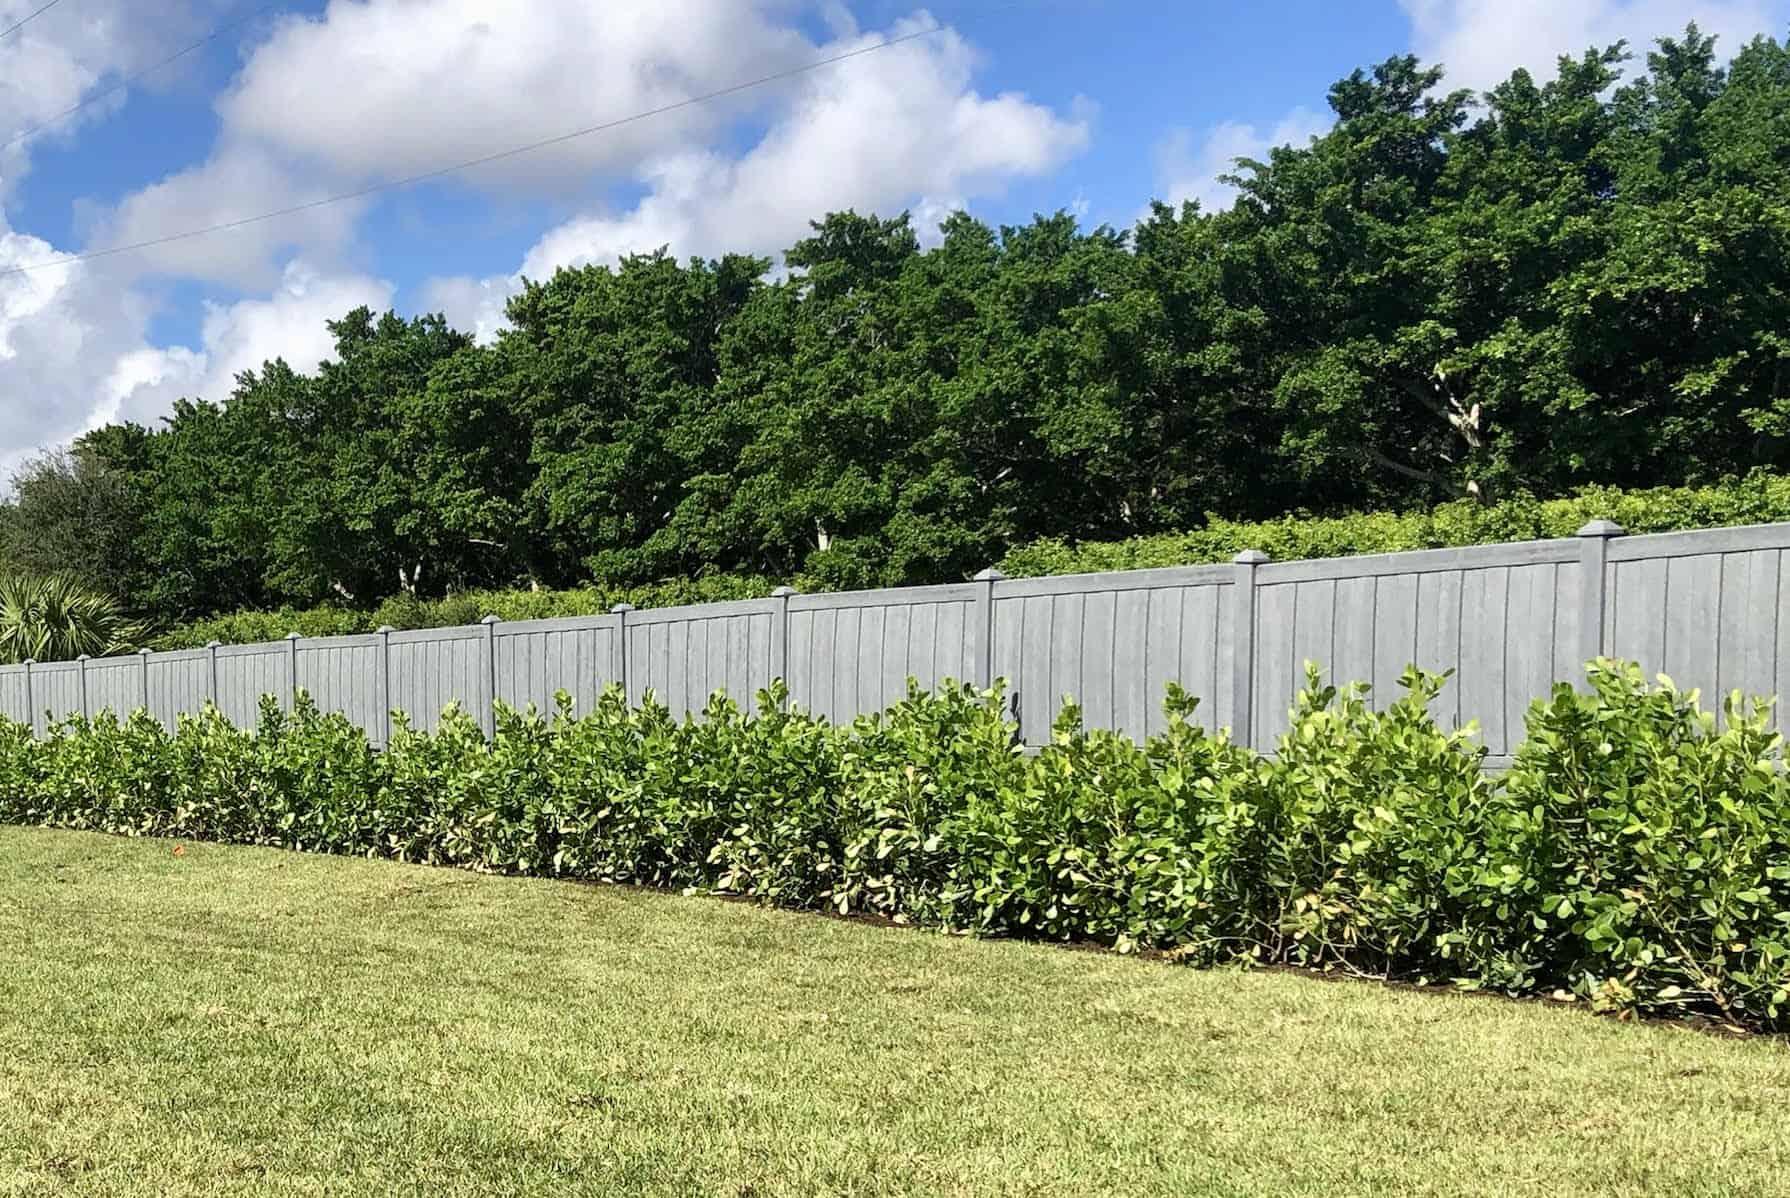 SimTek Fence Now Available